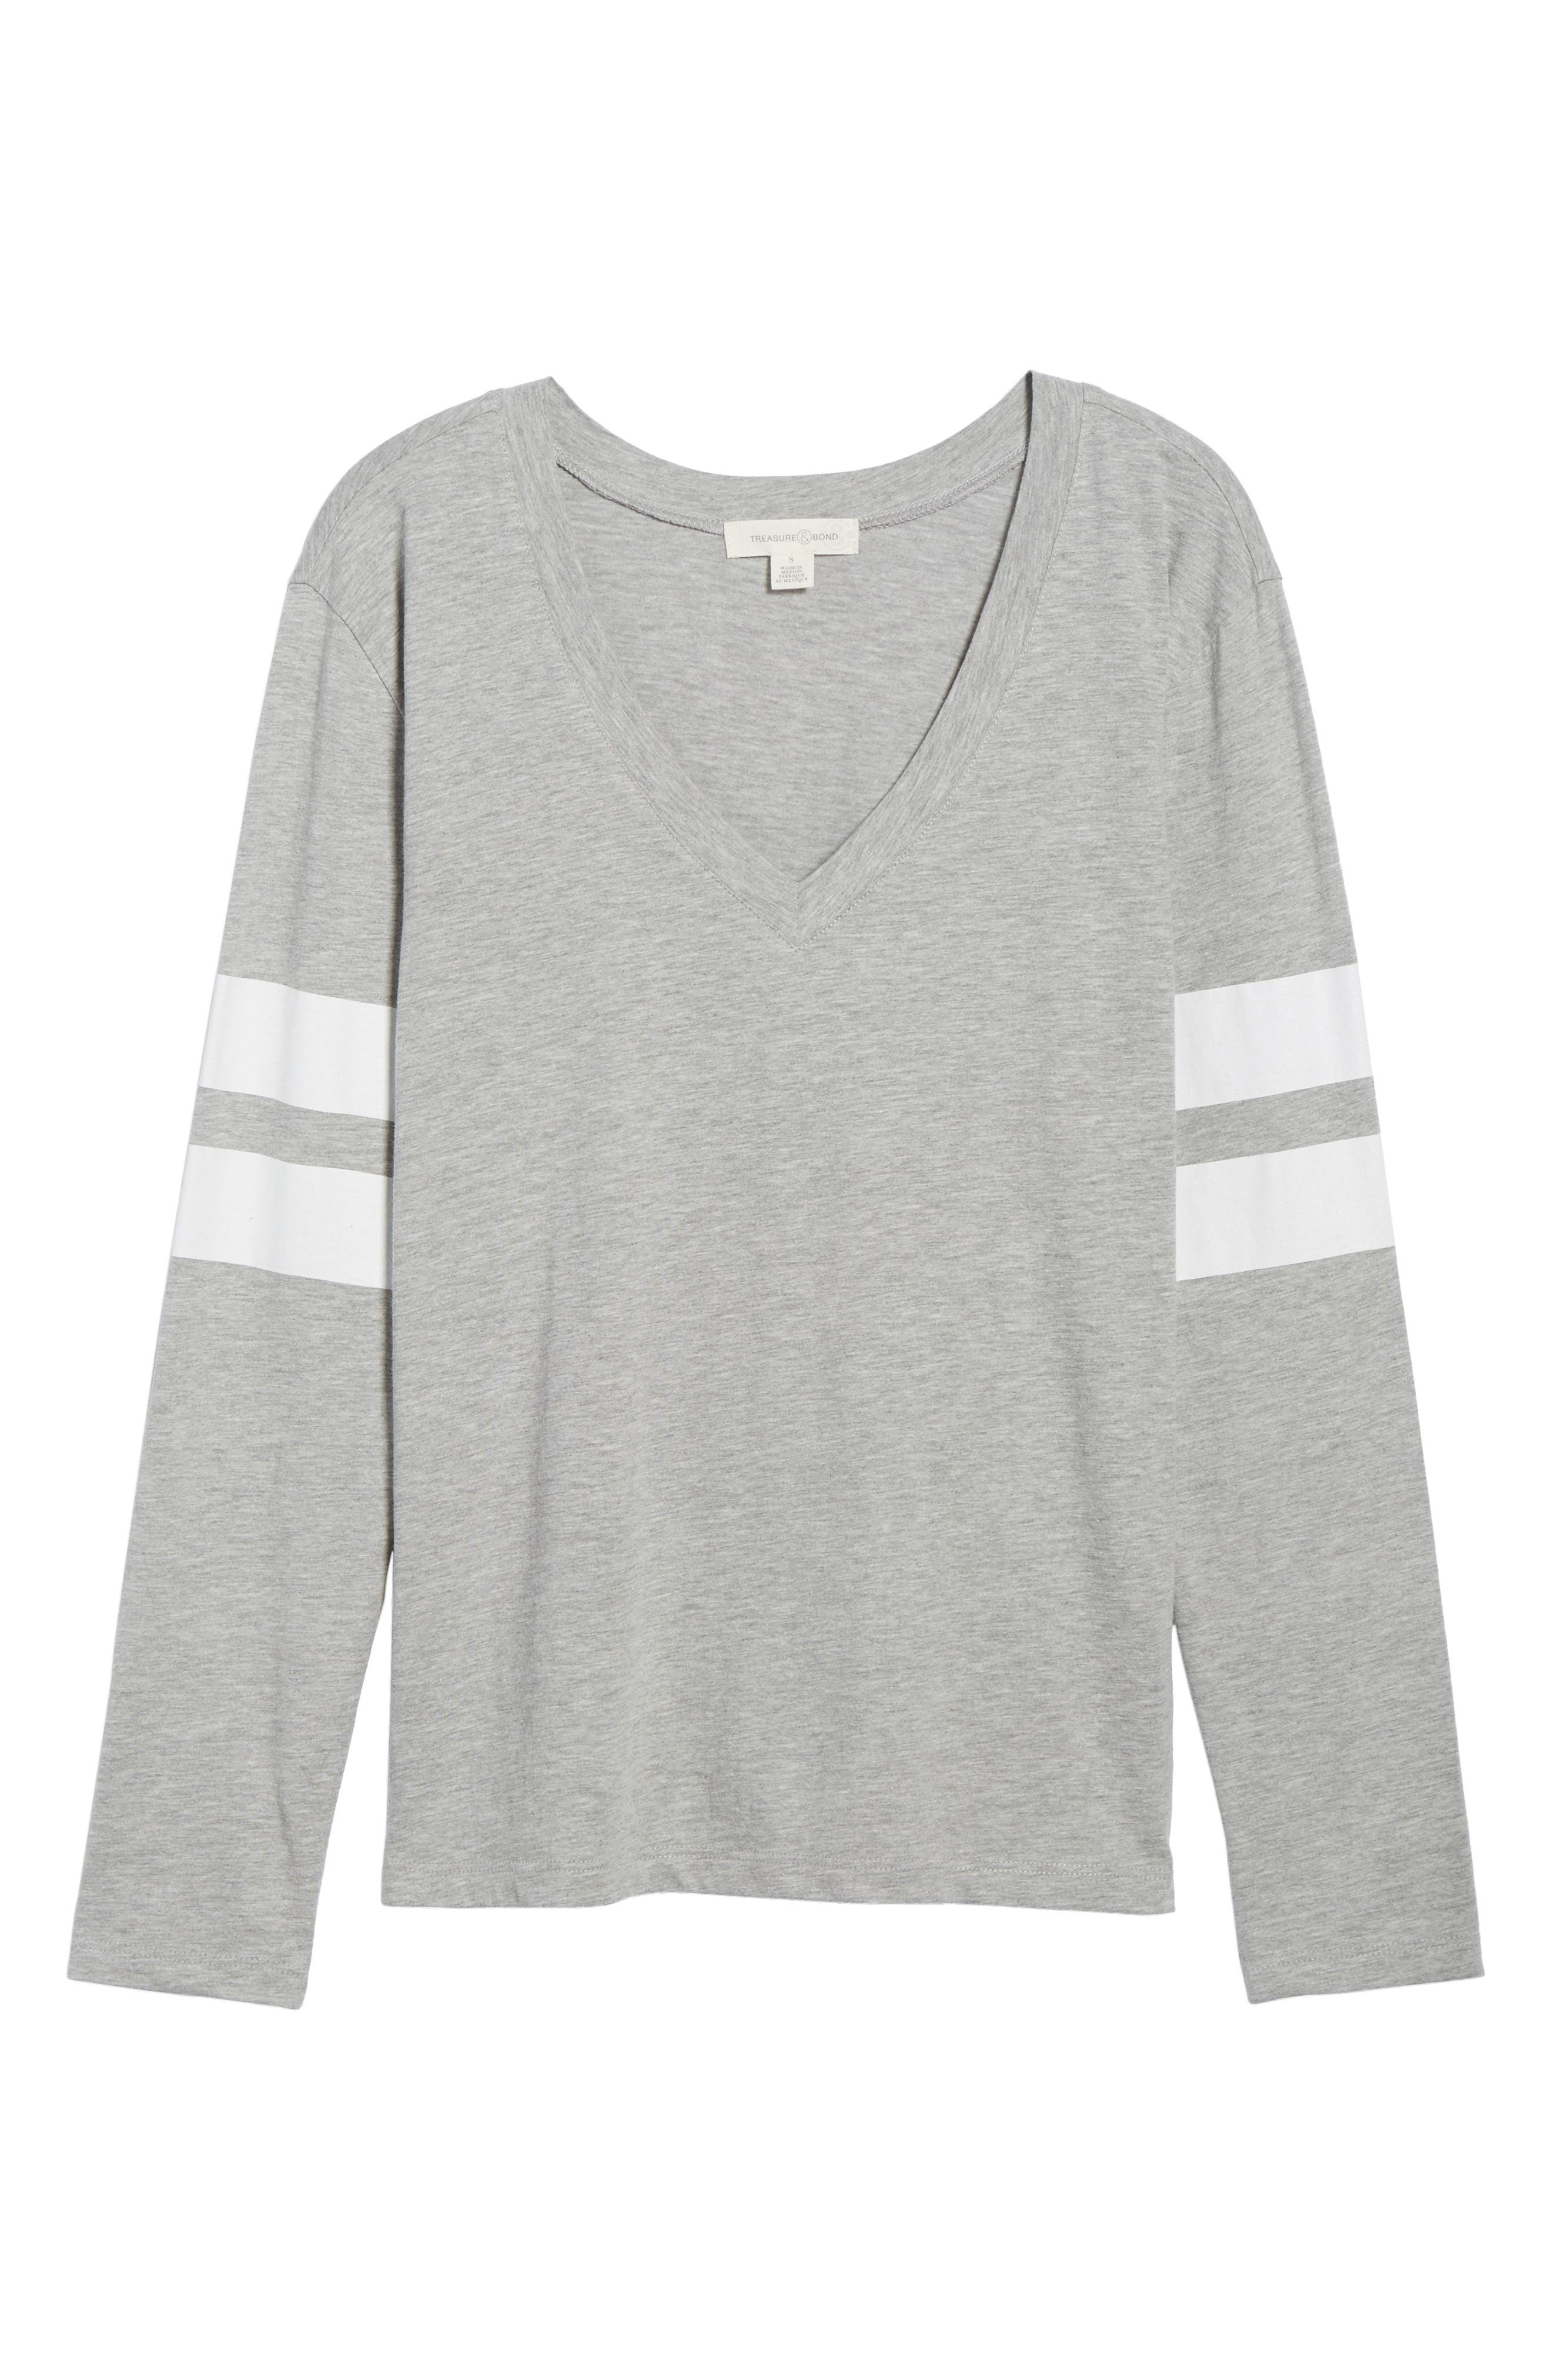 Varsity Stripe Tee,                             Alternate thumbnail 6, color,                             Grey Heather- White Combo